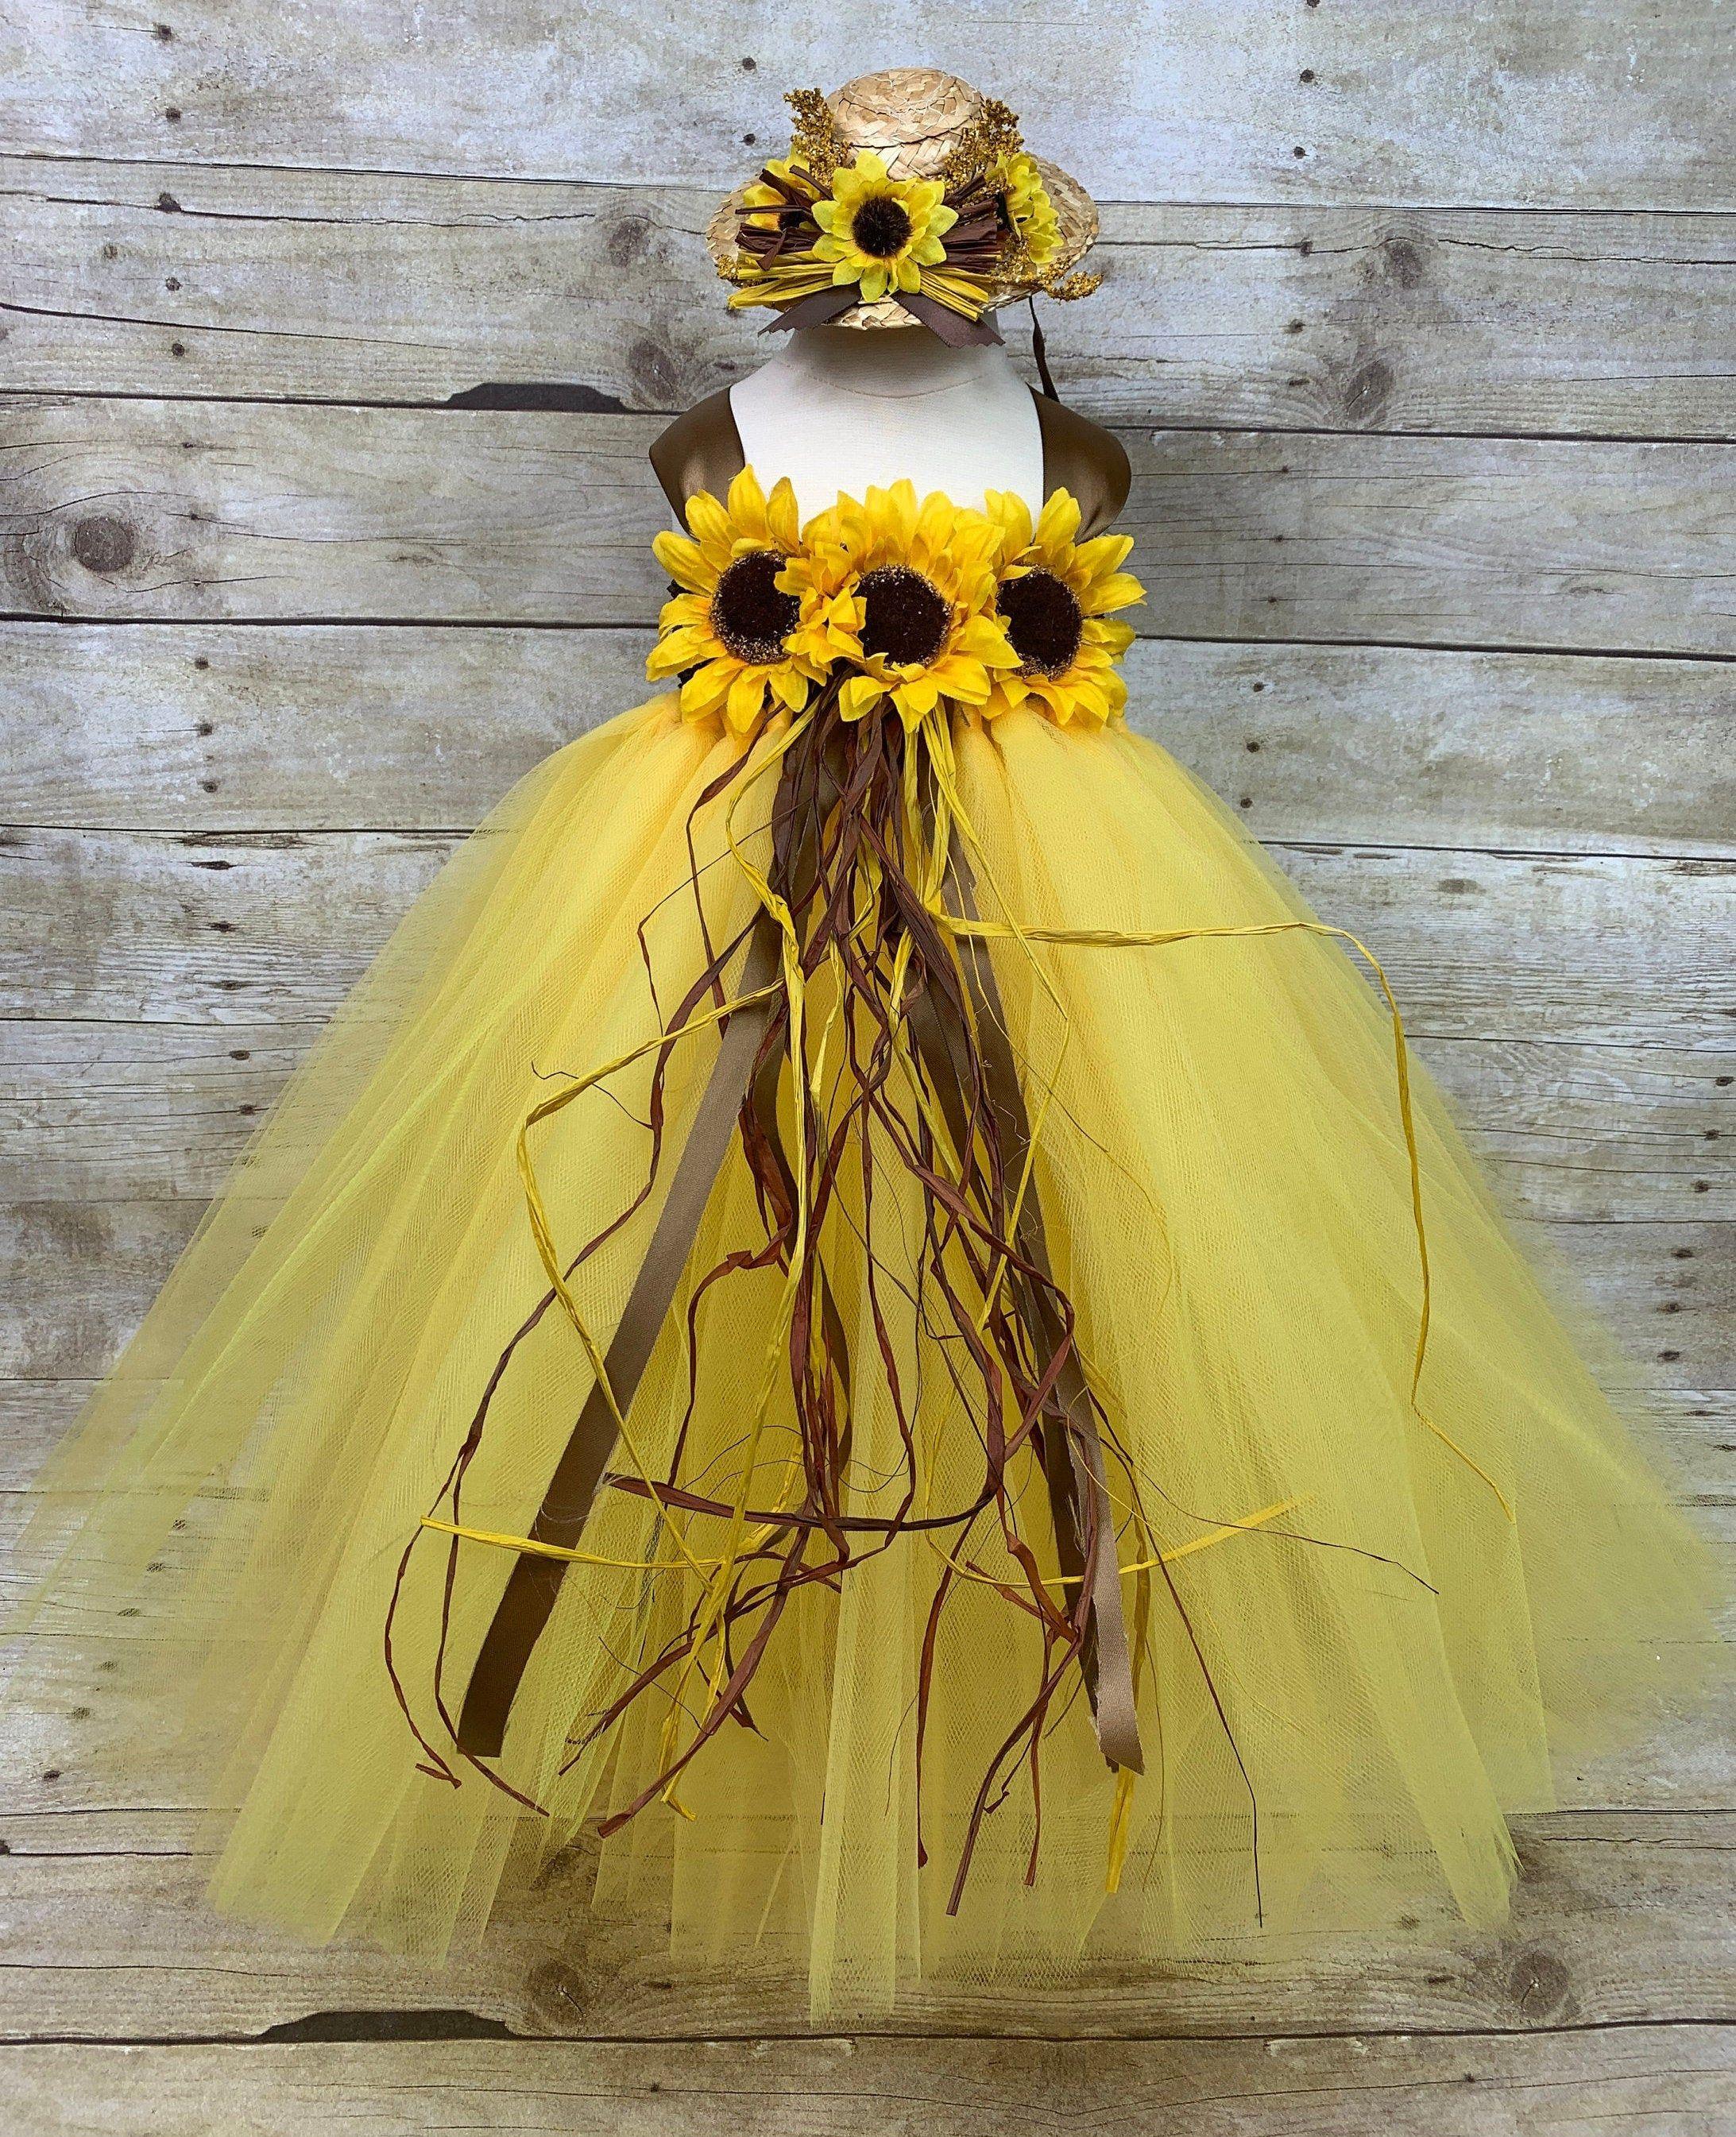 Sunflower Yellow Tutu Dress Headband 12 To 24 Mos 2t Baby Ready To Ship Fall Flower Girl Wedding Pageant Birthday Scarecrow Photo Fall Flower Girl Flower Girl Dresses Blue Yellow Tutu [ 2690 x 2185 Pixel ]